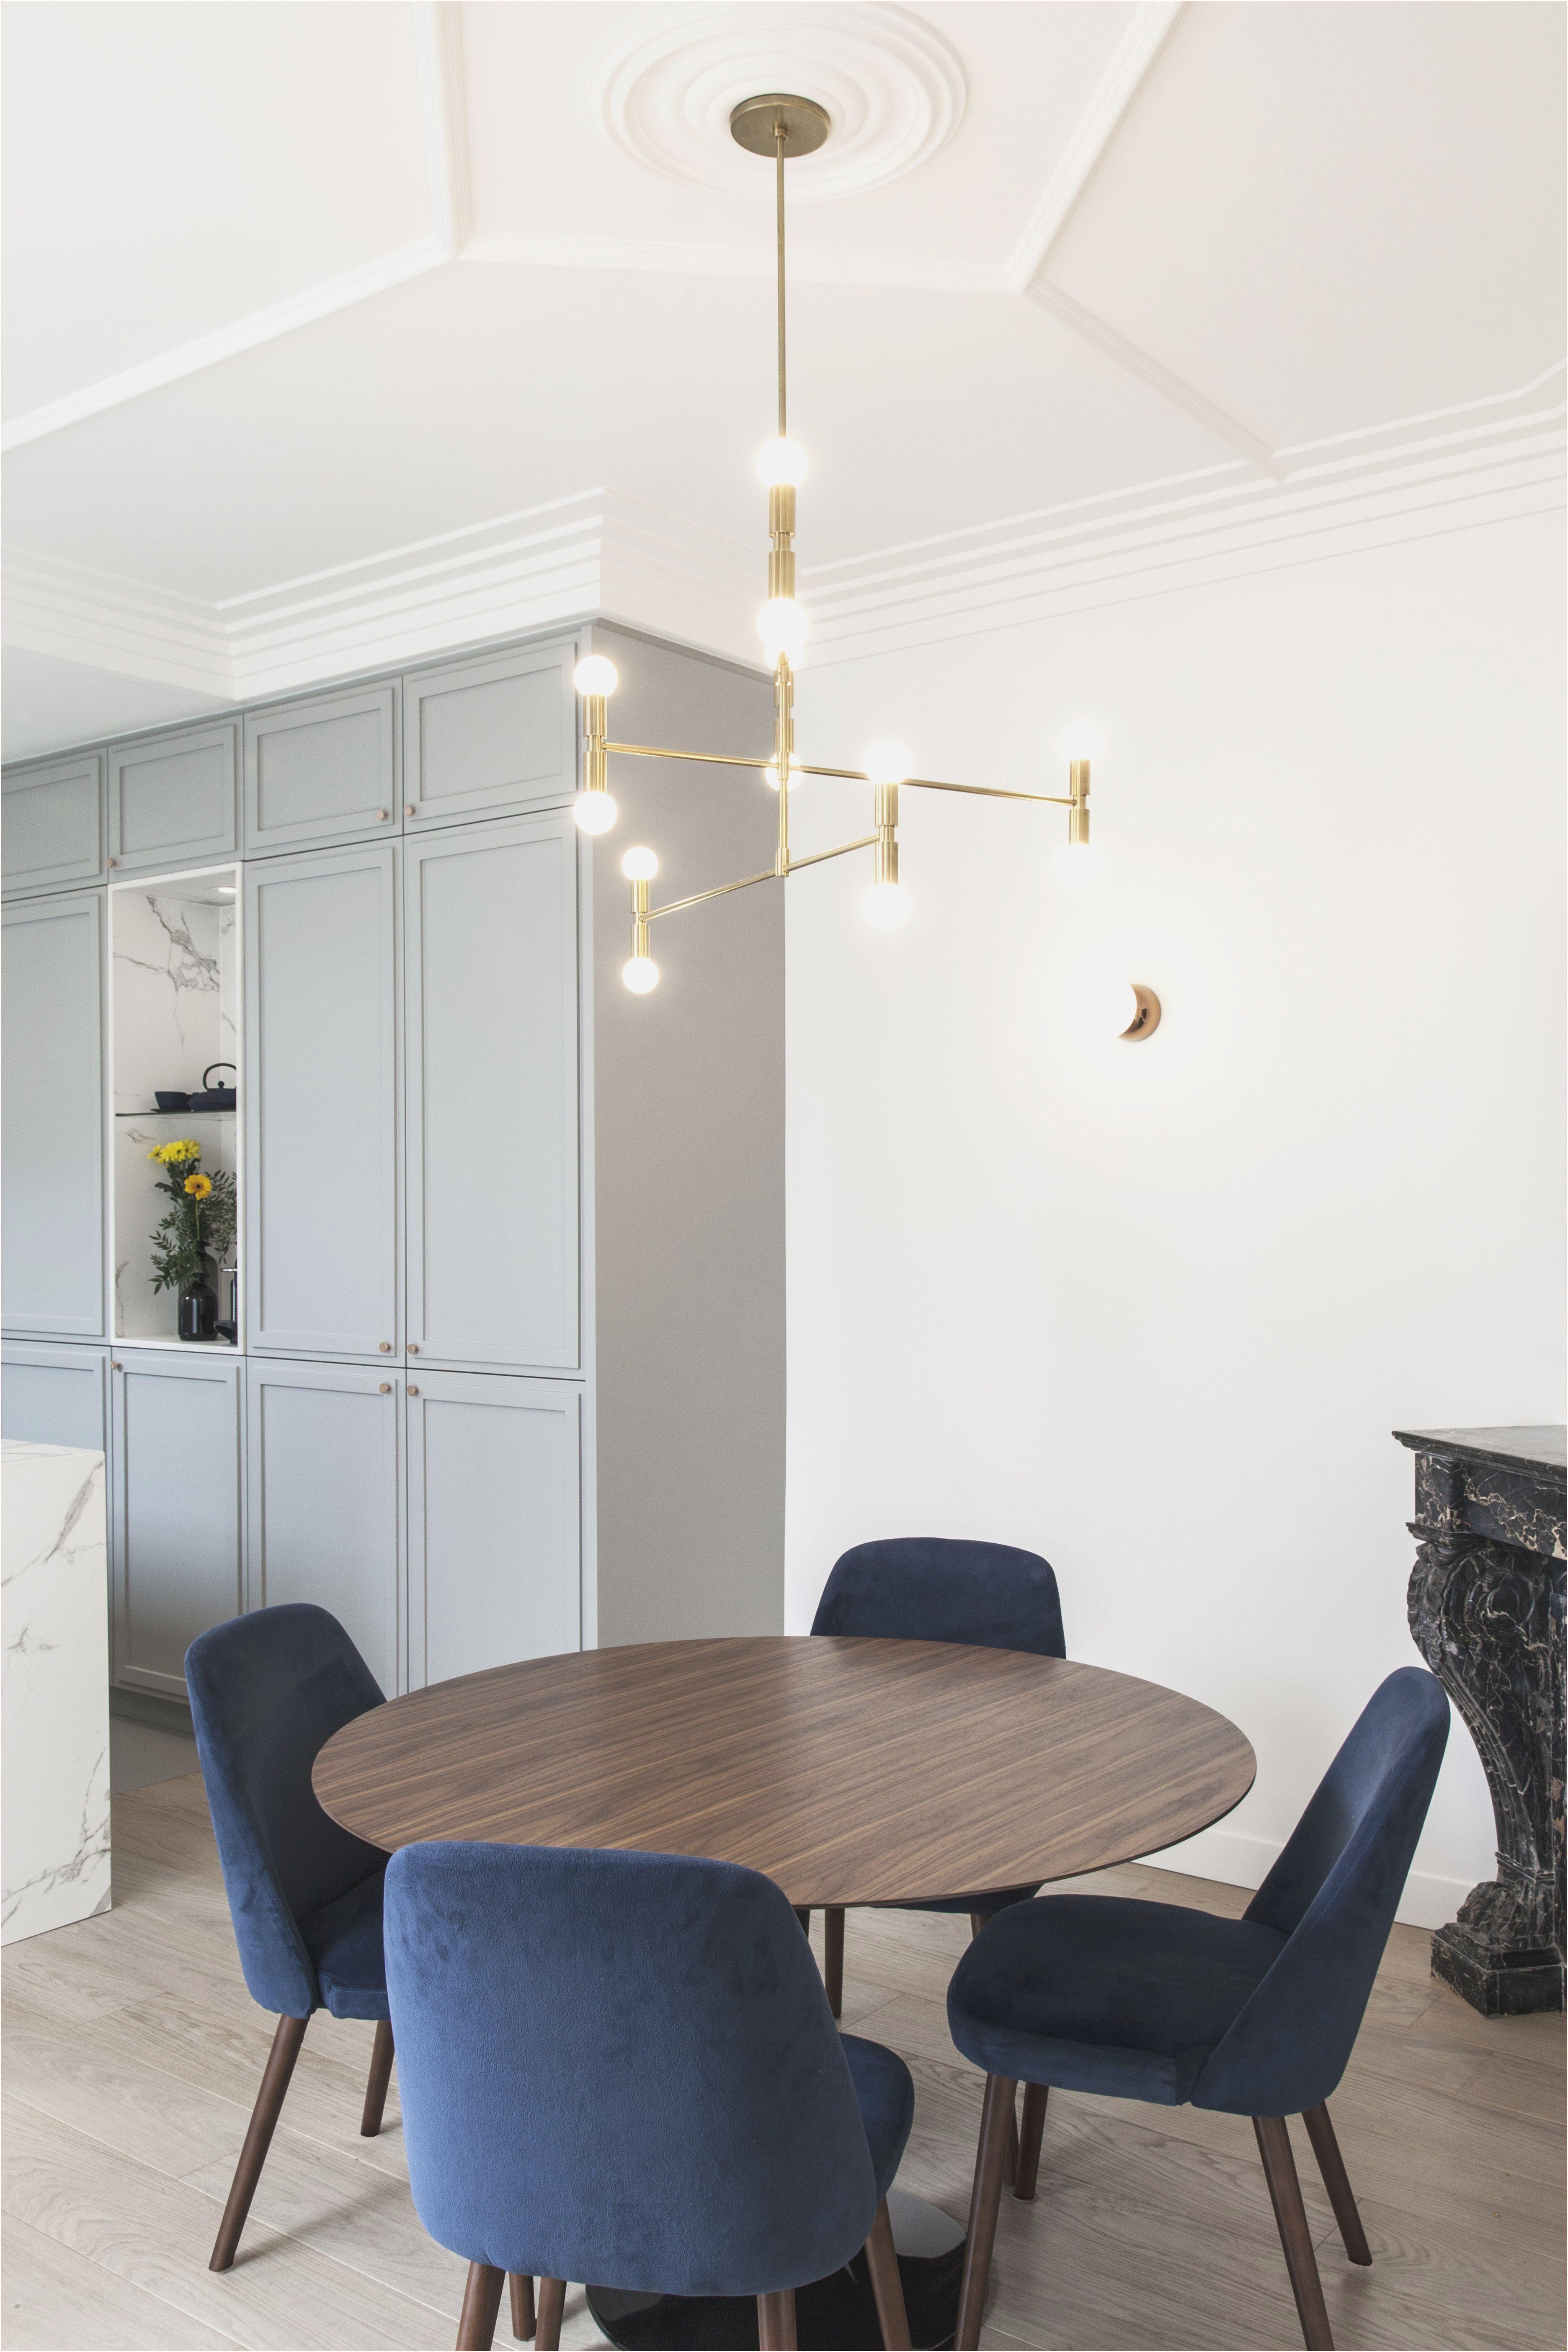 14 plaisant lustre salle manger conforama photograph - Conforama chaises salle a manger ...